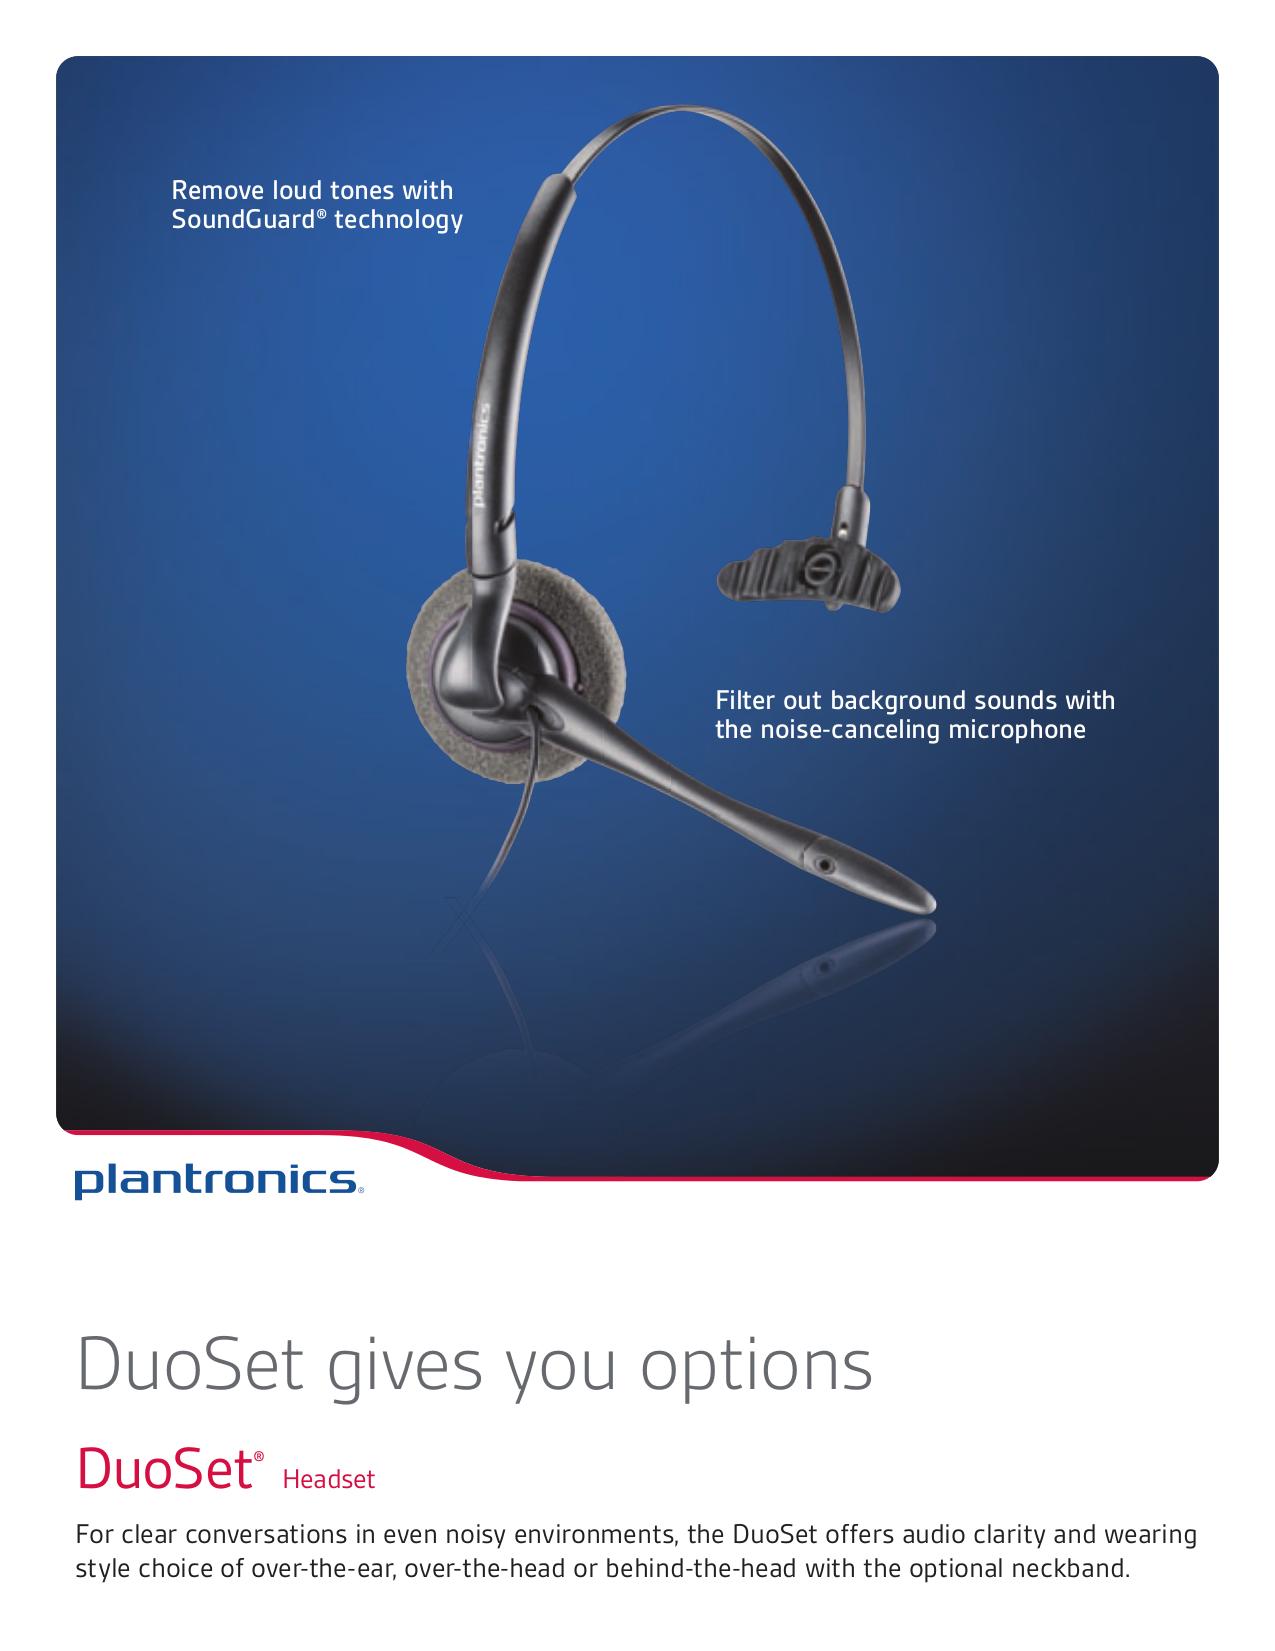 Download free pdf for Plantronics DuoSet H141N Headset manual